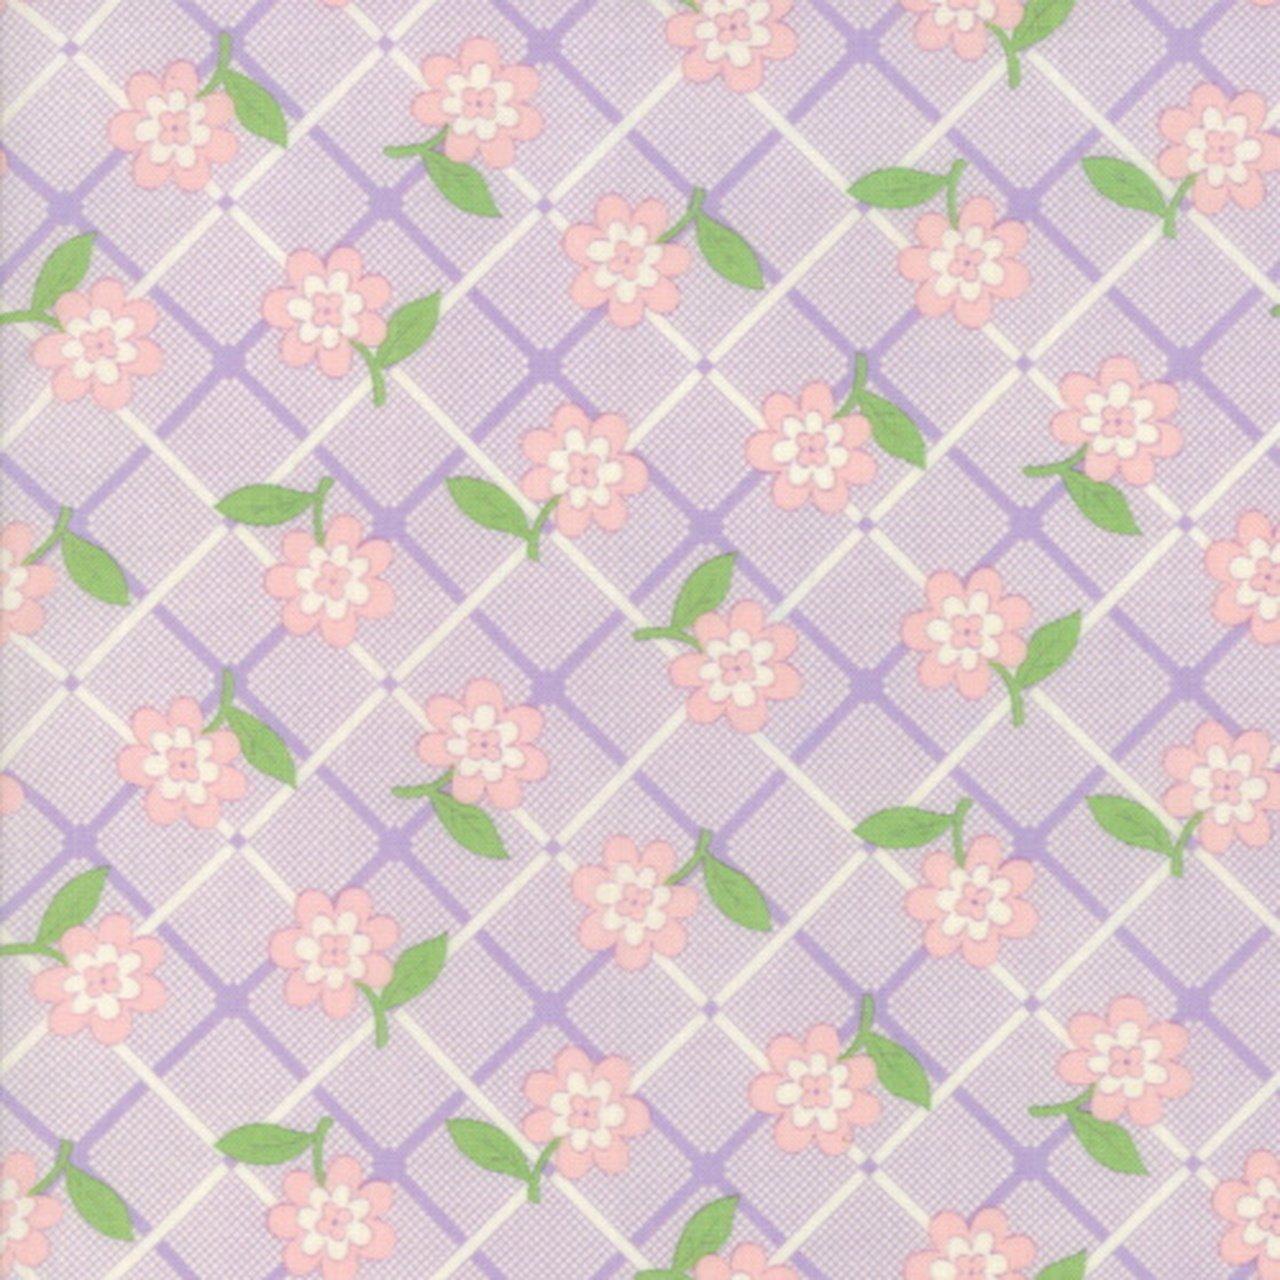 30s Playtime Chloe's Closet 2018 Lilac 33354-12